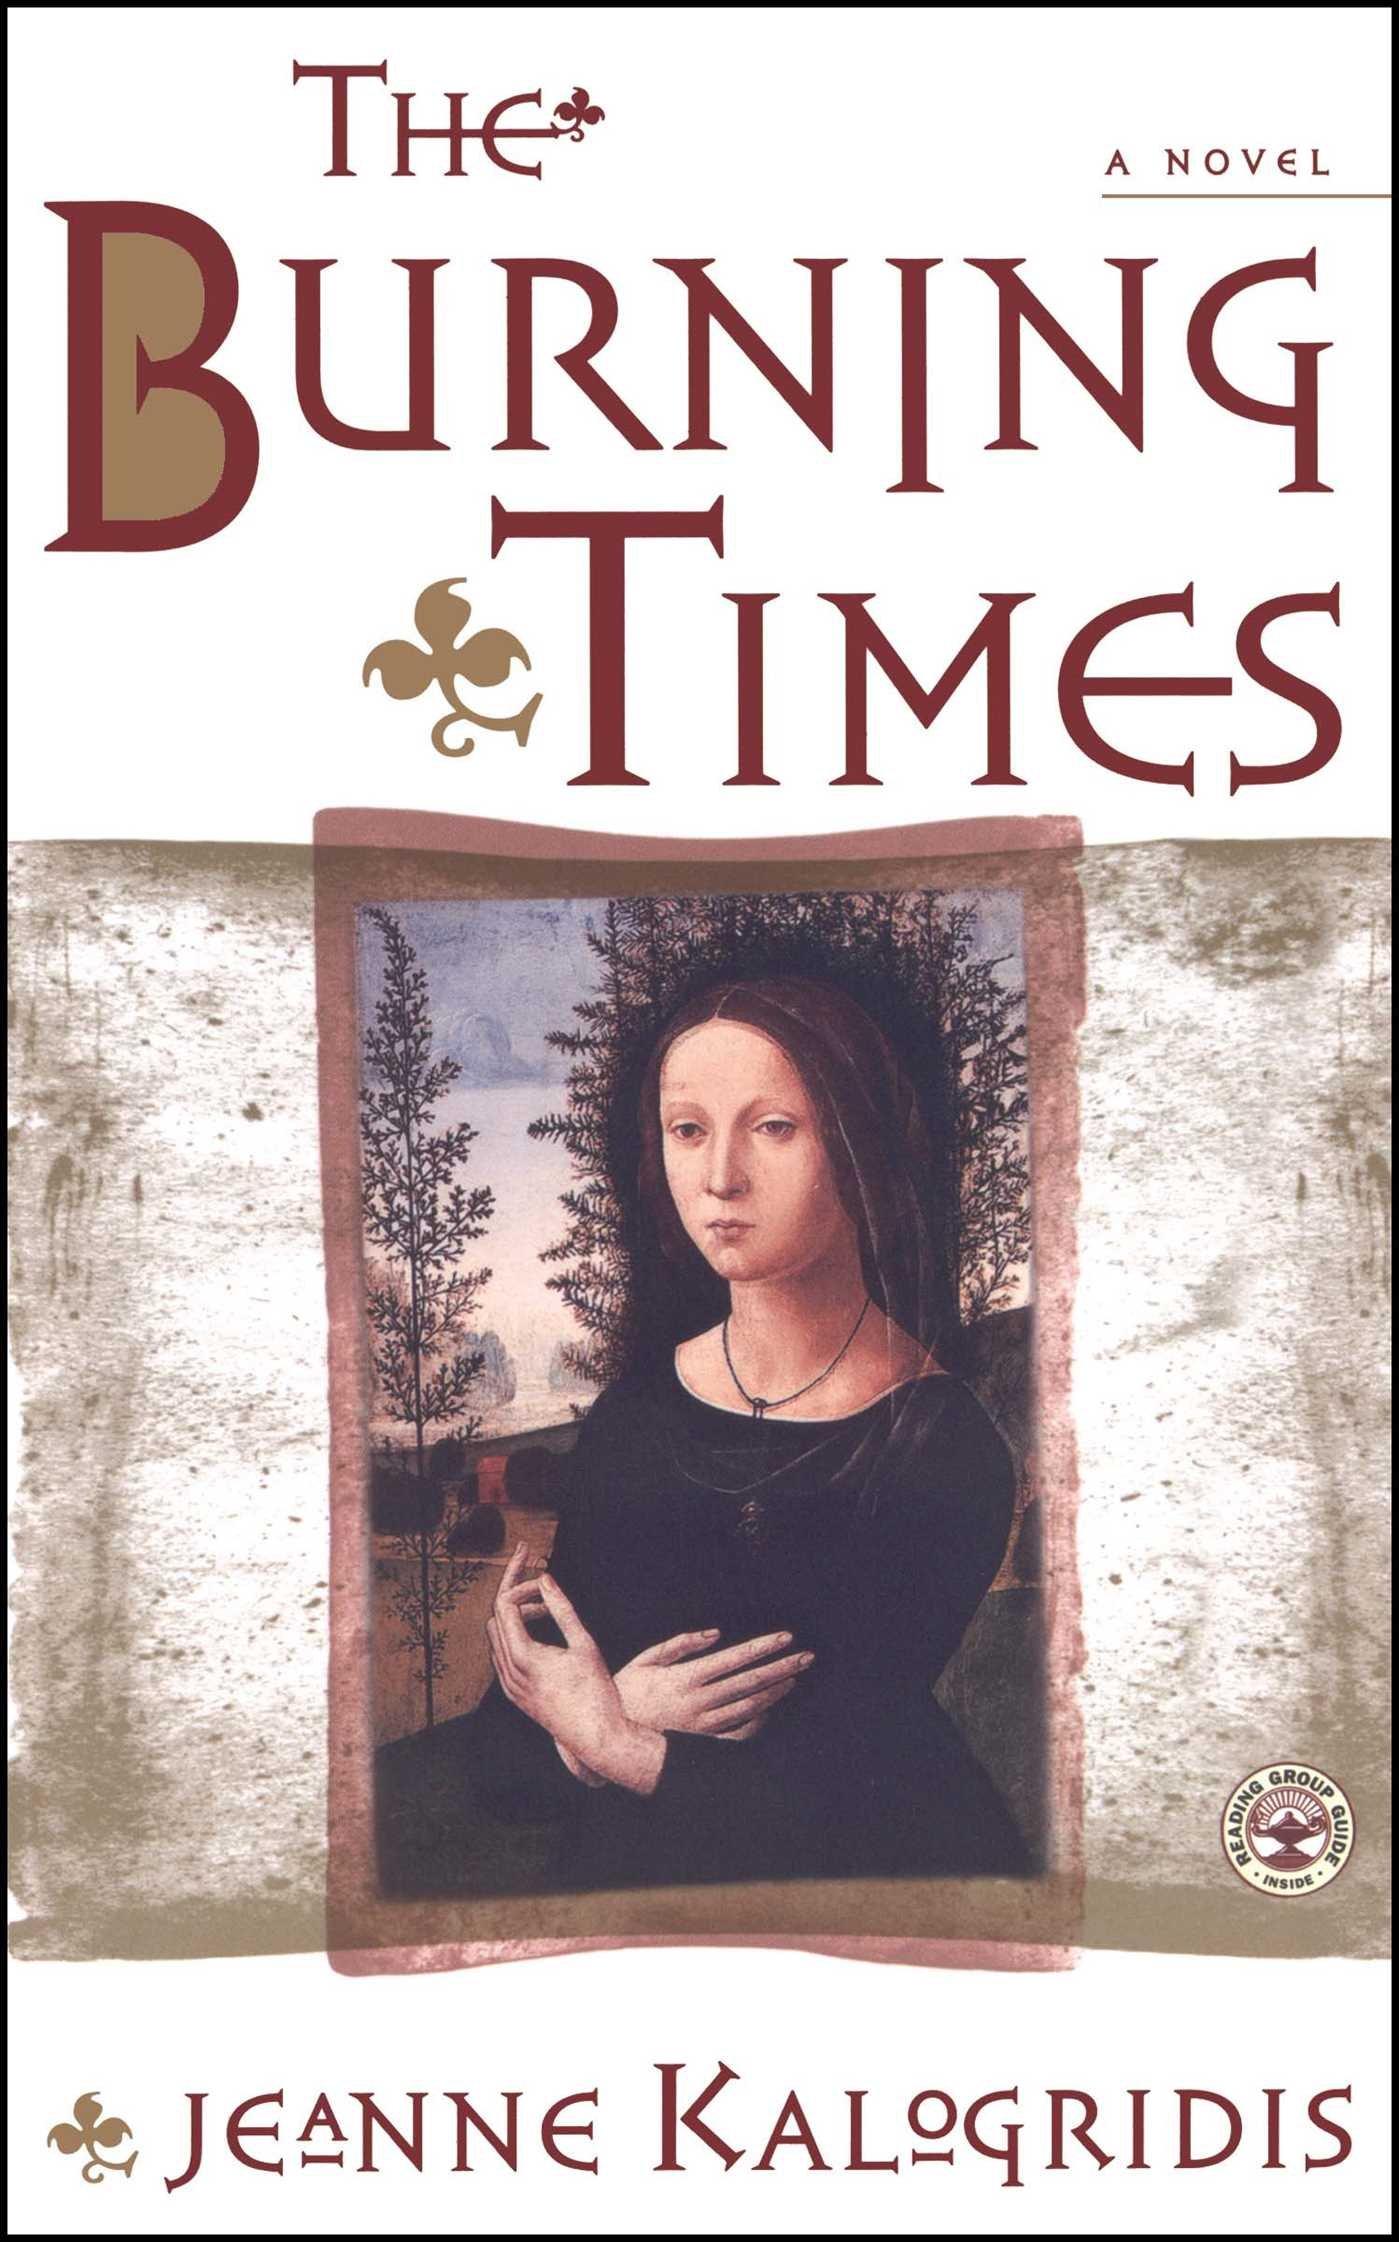 The Burning Times: A Novel: Jeanne Kalogridis: 9780684869247: Amazon:  Books